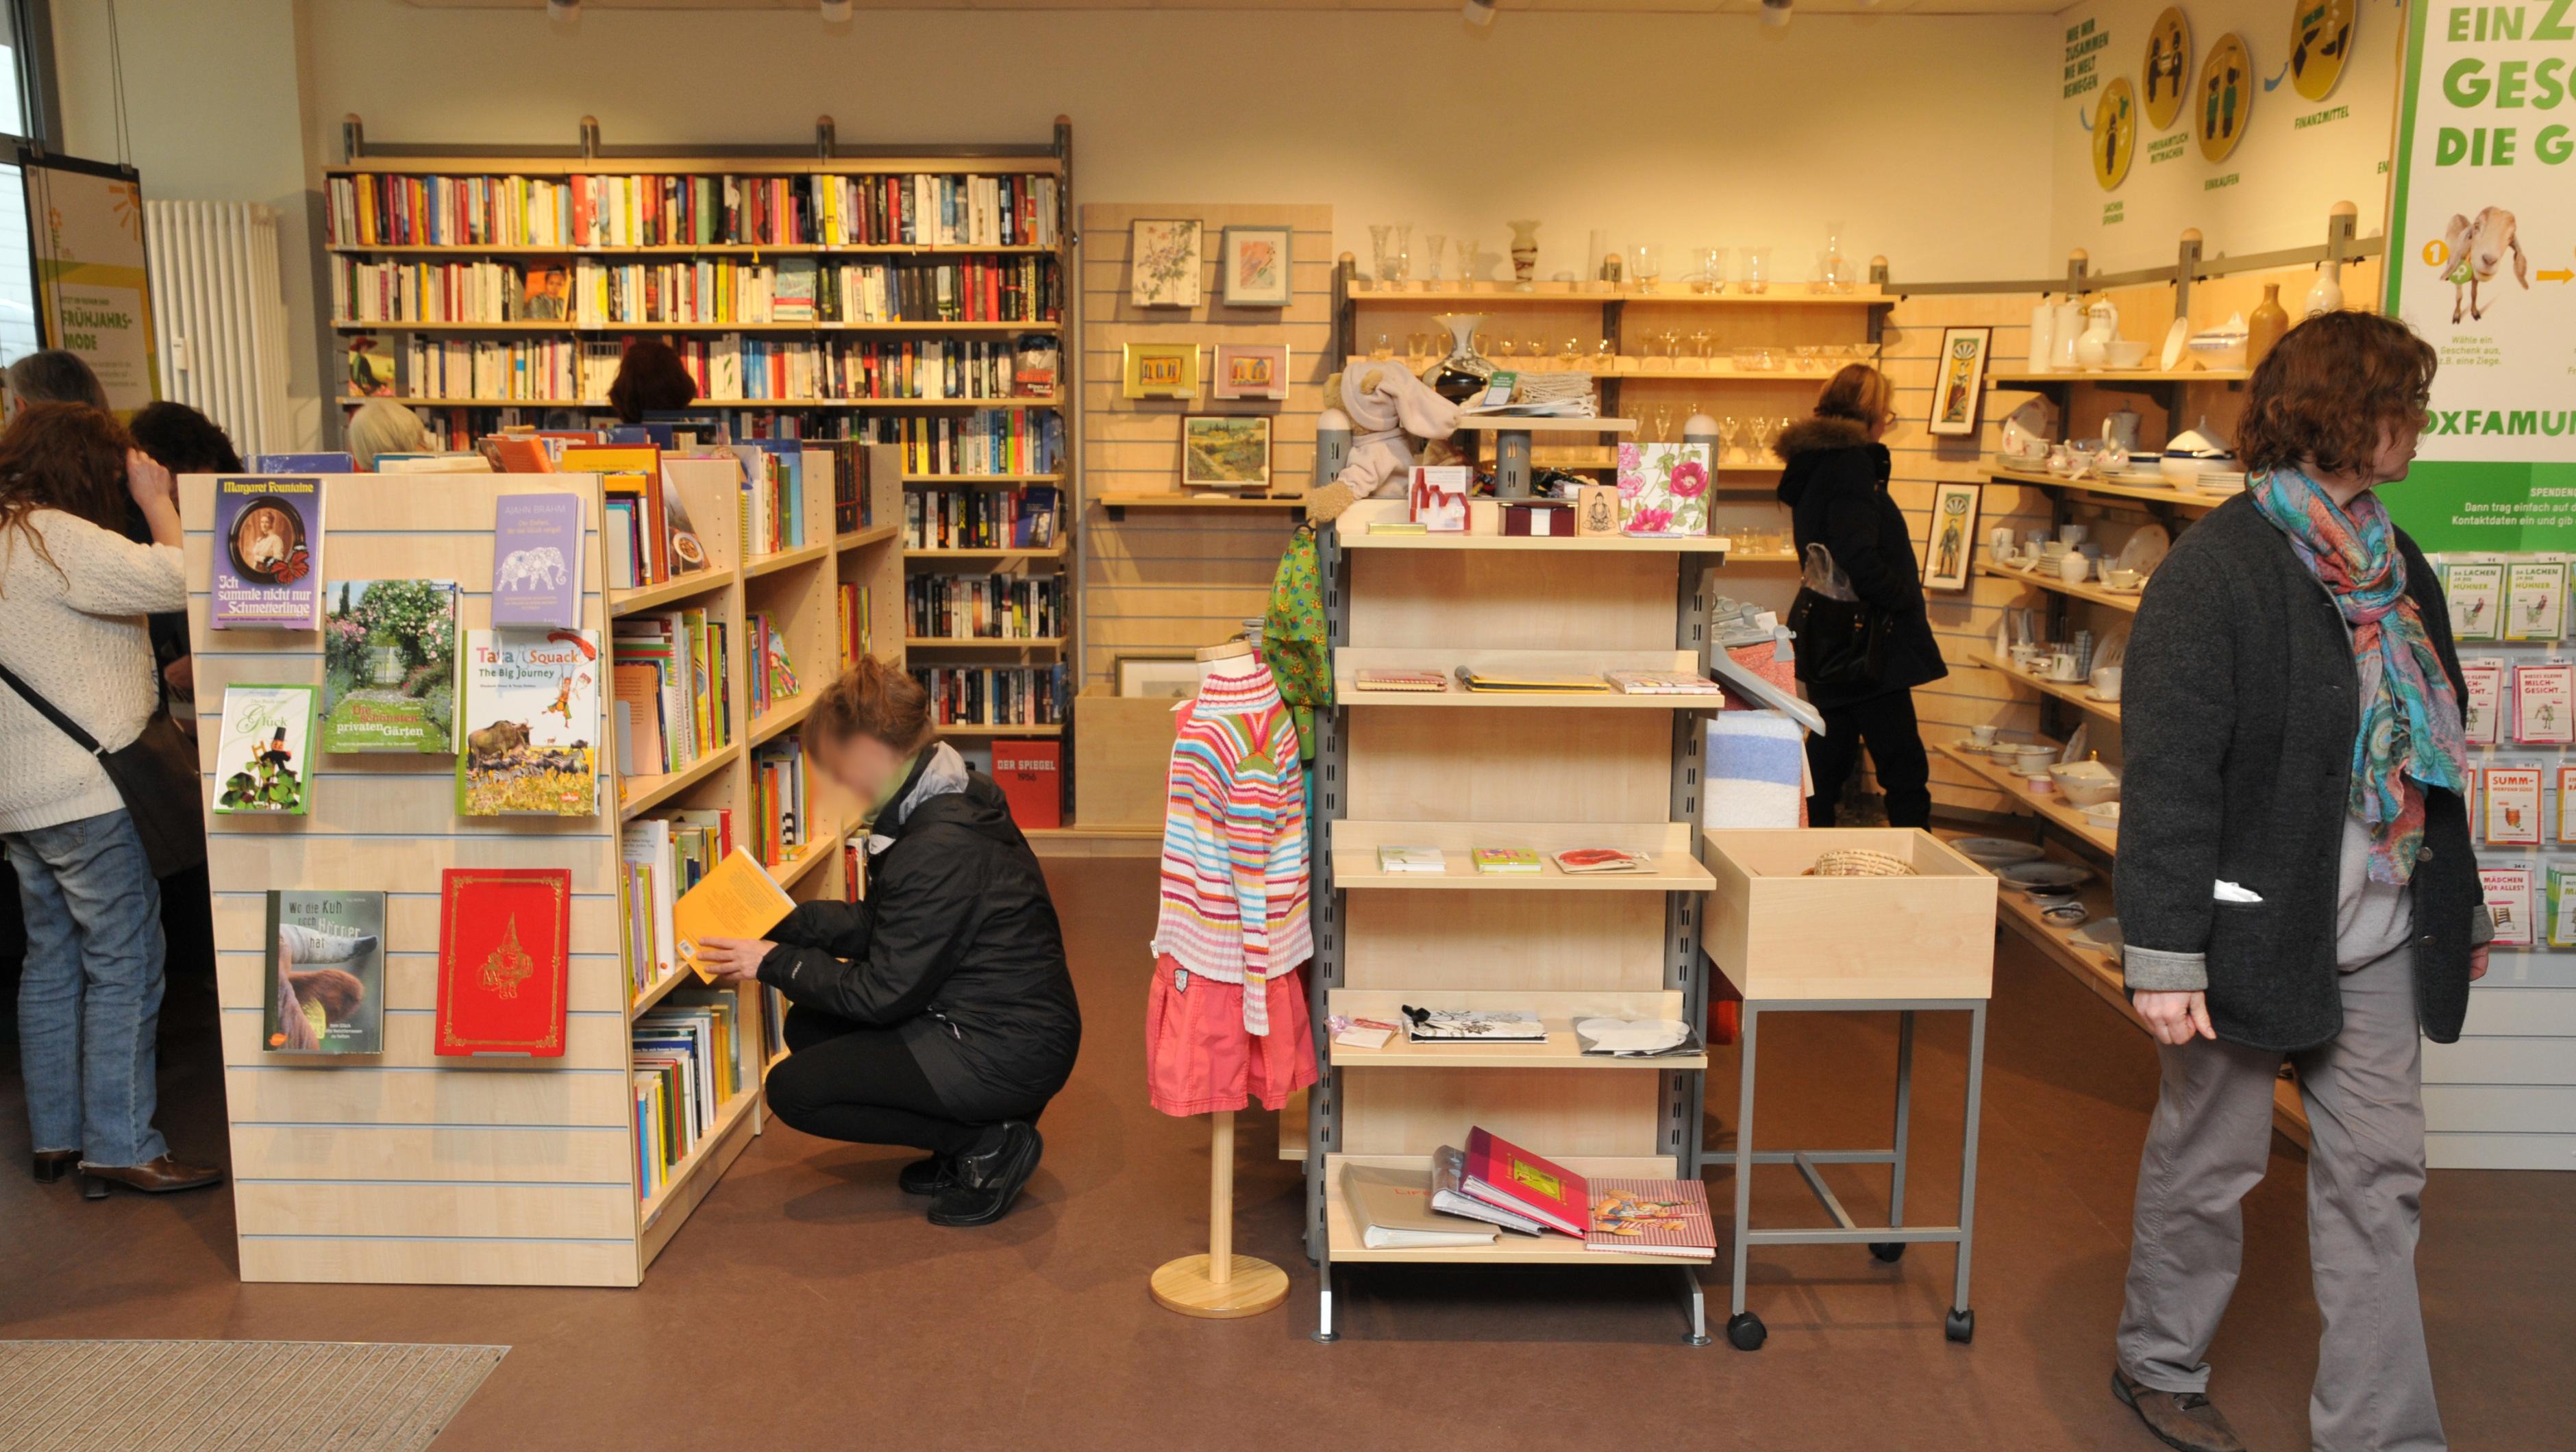 Oxfam Shop Aachen - Innenansicht